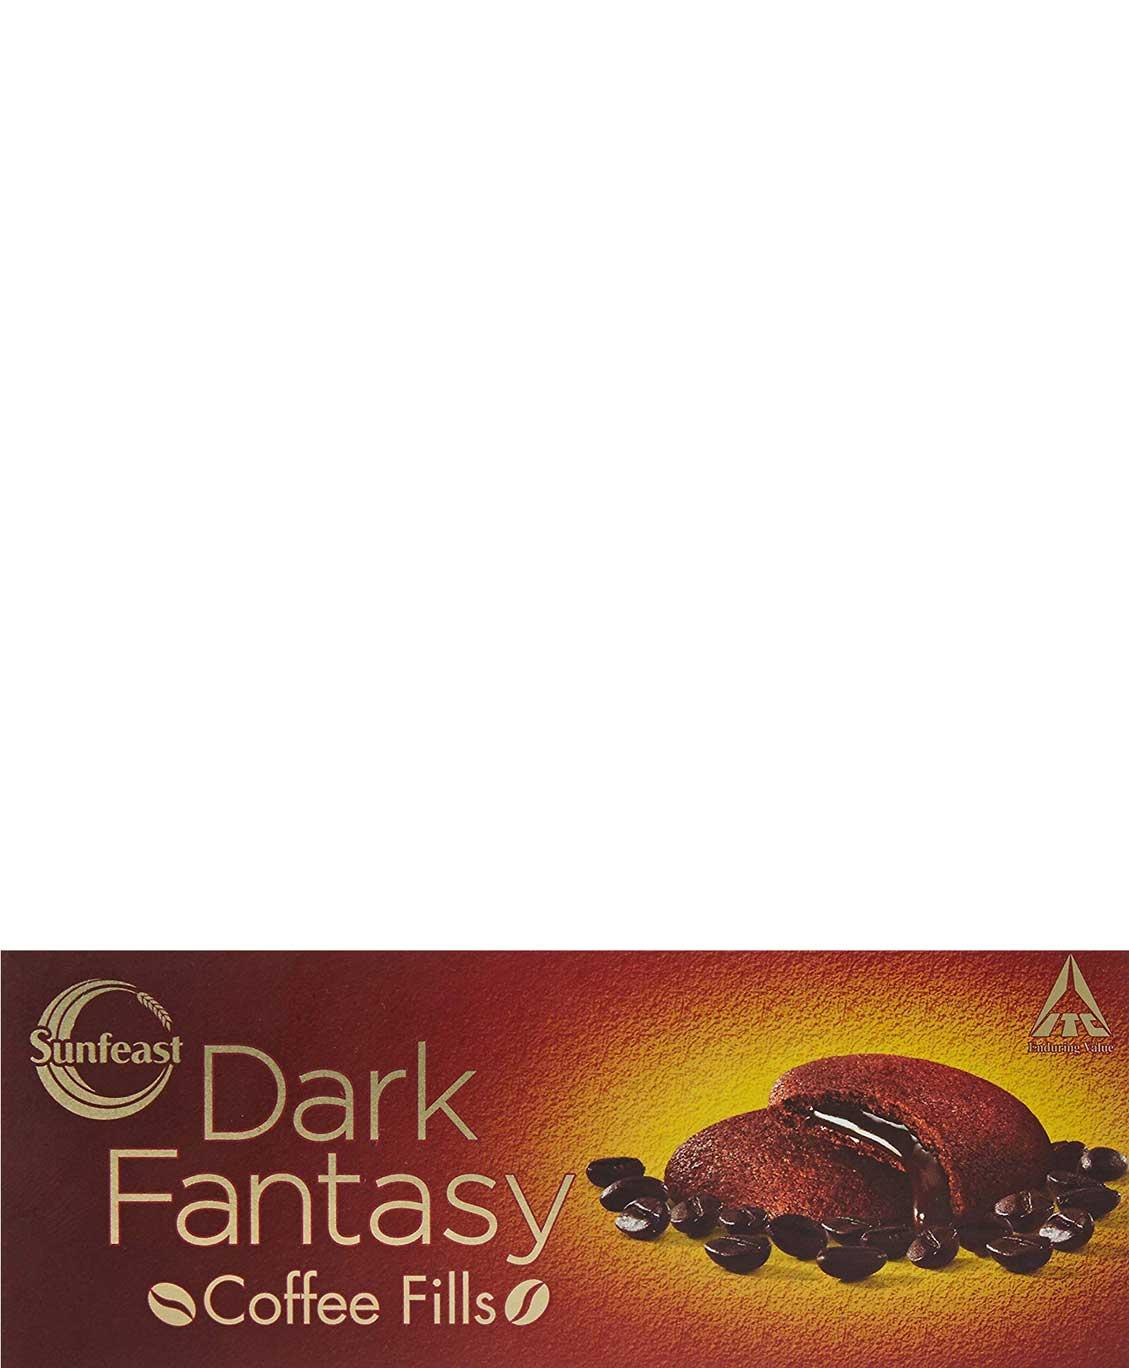 Sunfeast Dark Fantasy Coffee Fills 75 g